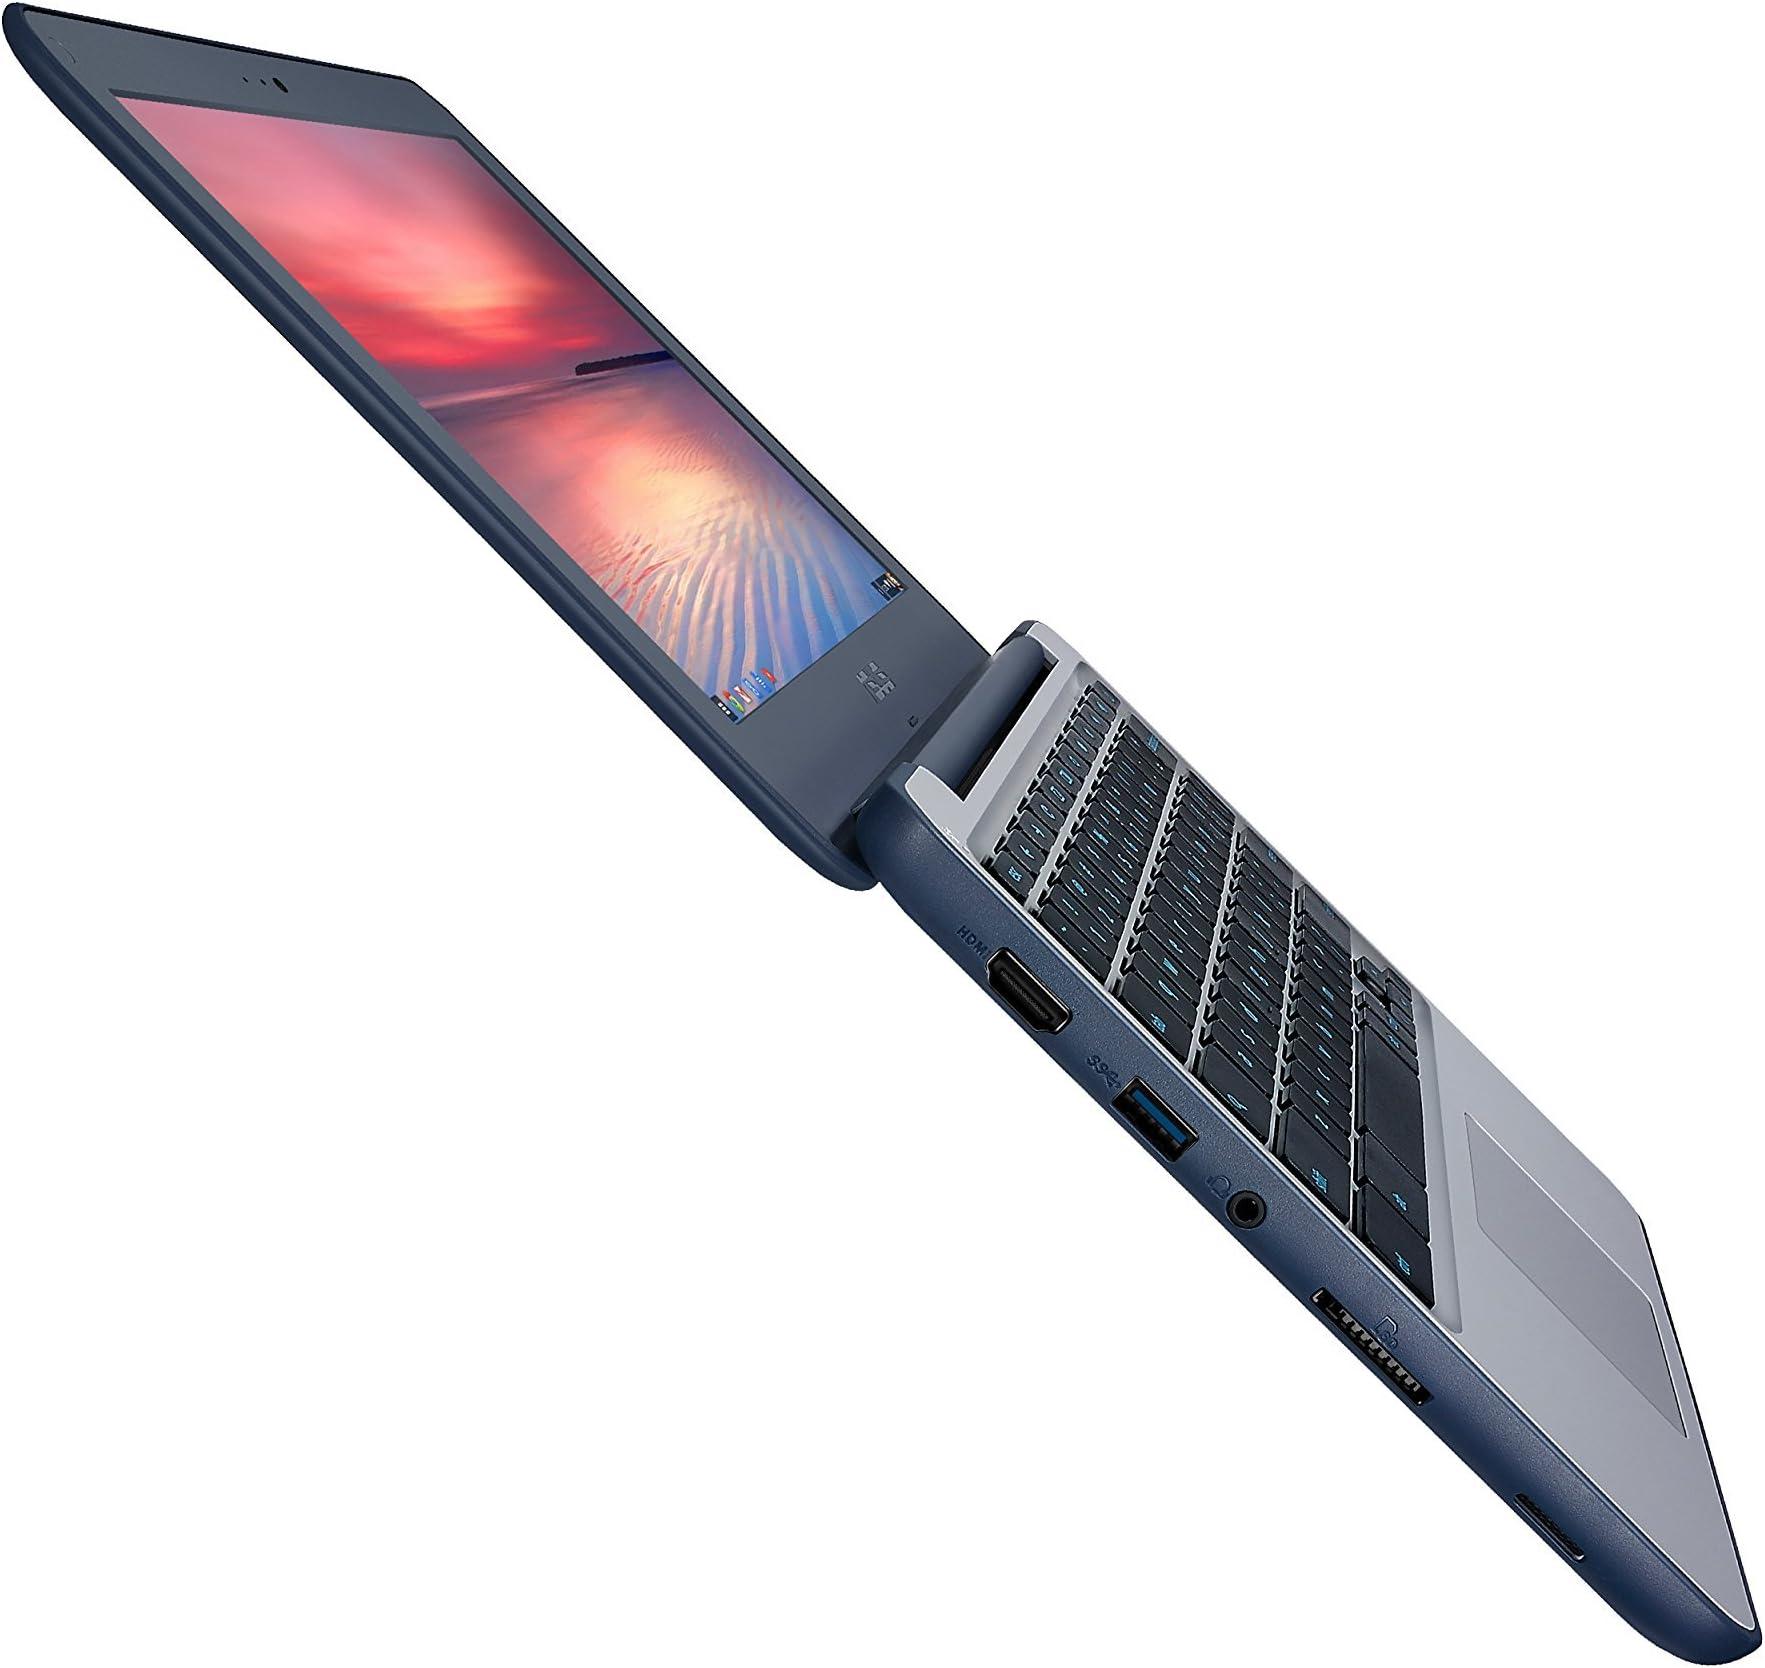 ASUS Chromebook C202SA-YS02 11.6in Ruggedized and Water Resistant Design with 180 Degree (Intel Celeron 4 GB, 16GB eMMC, Dark Blue, Silver) (Renewed)